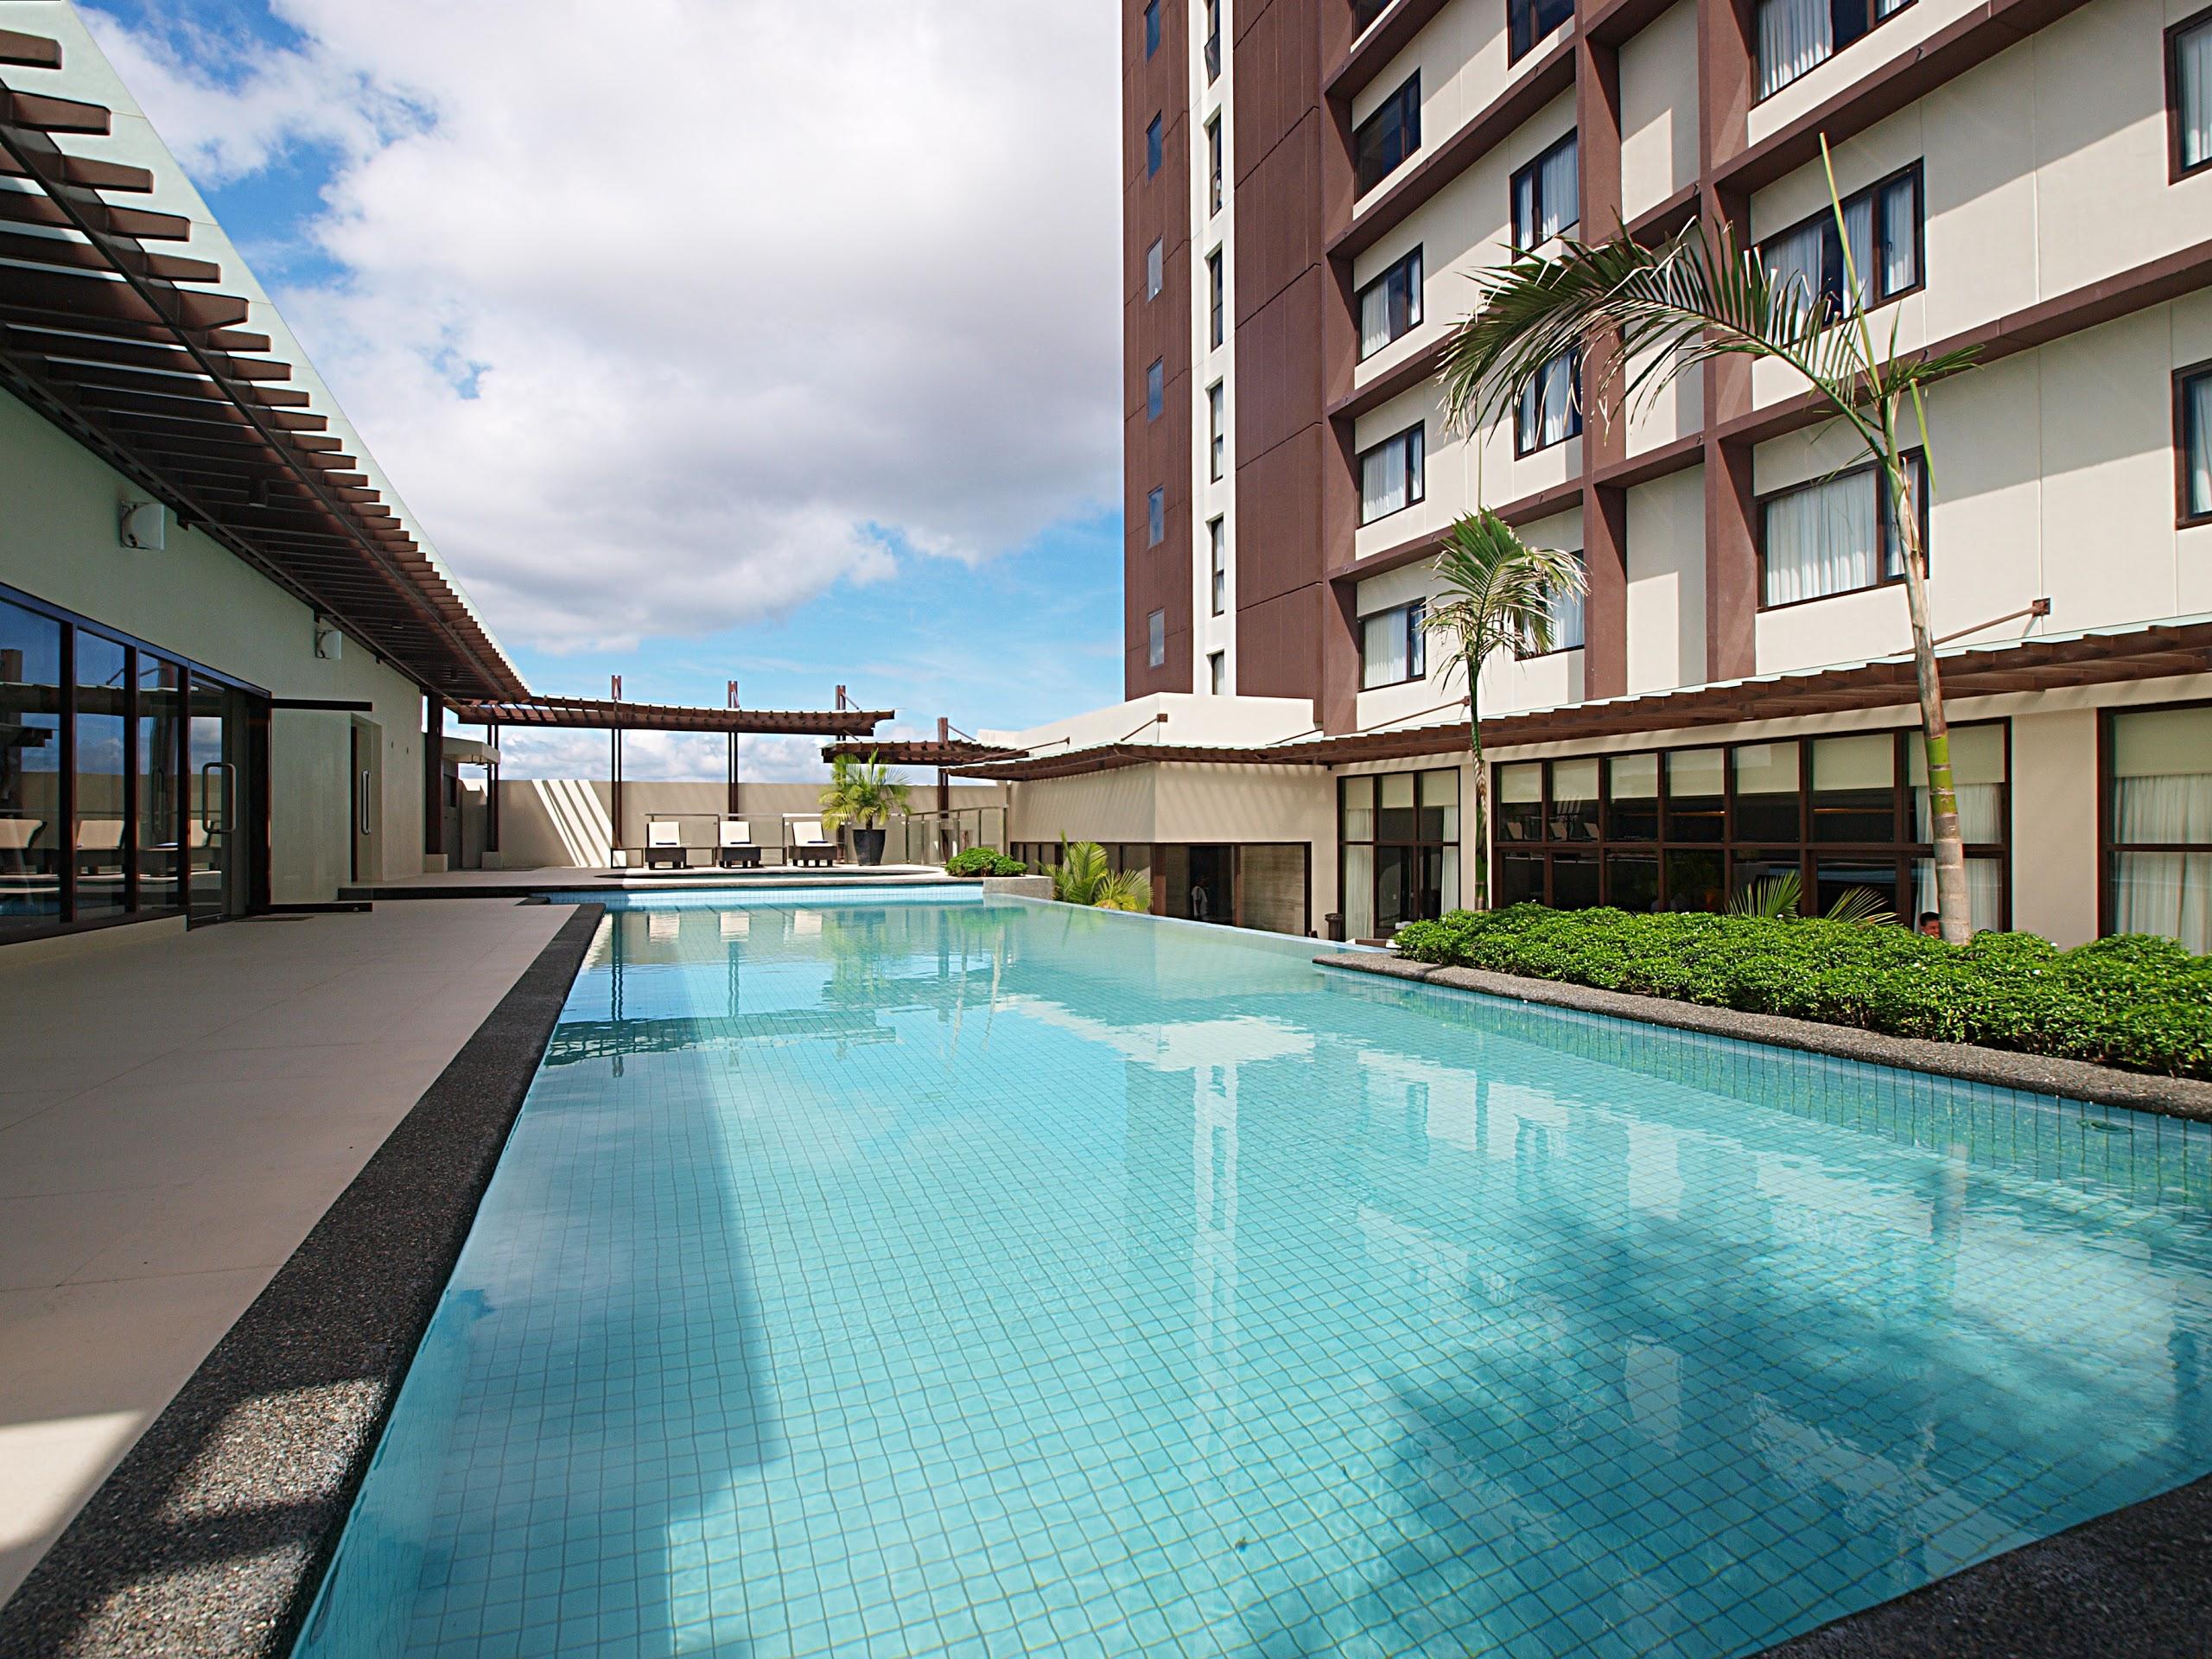 Seda Hotel Centrio The Perfect Epitome Of Class Elegance Modernity